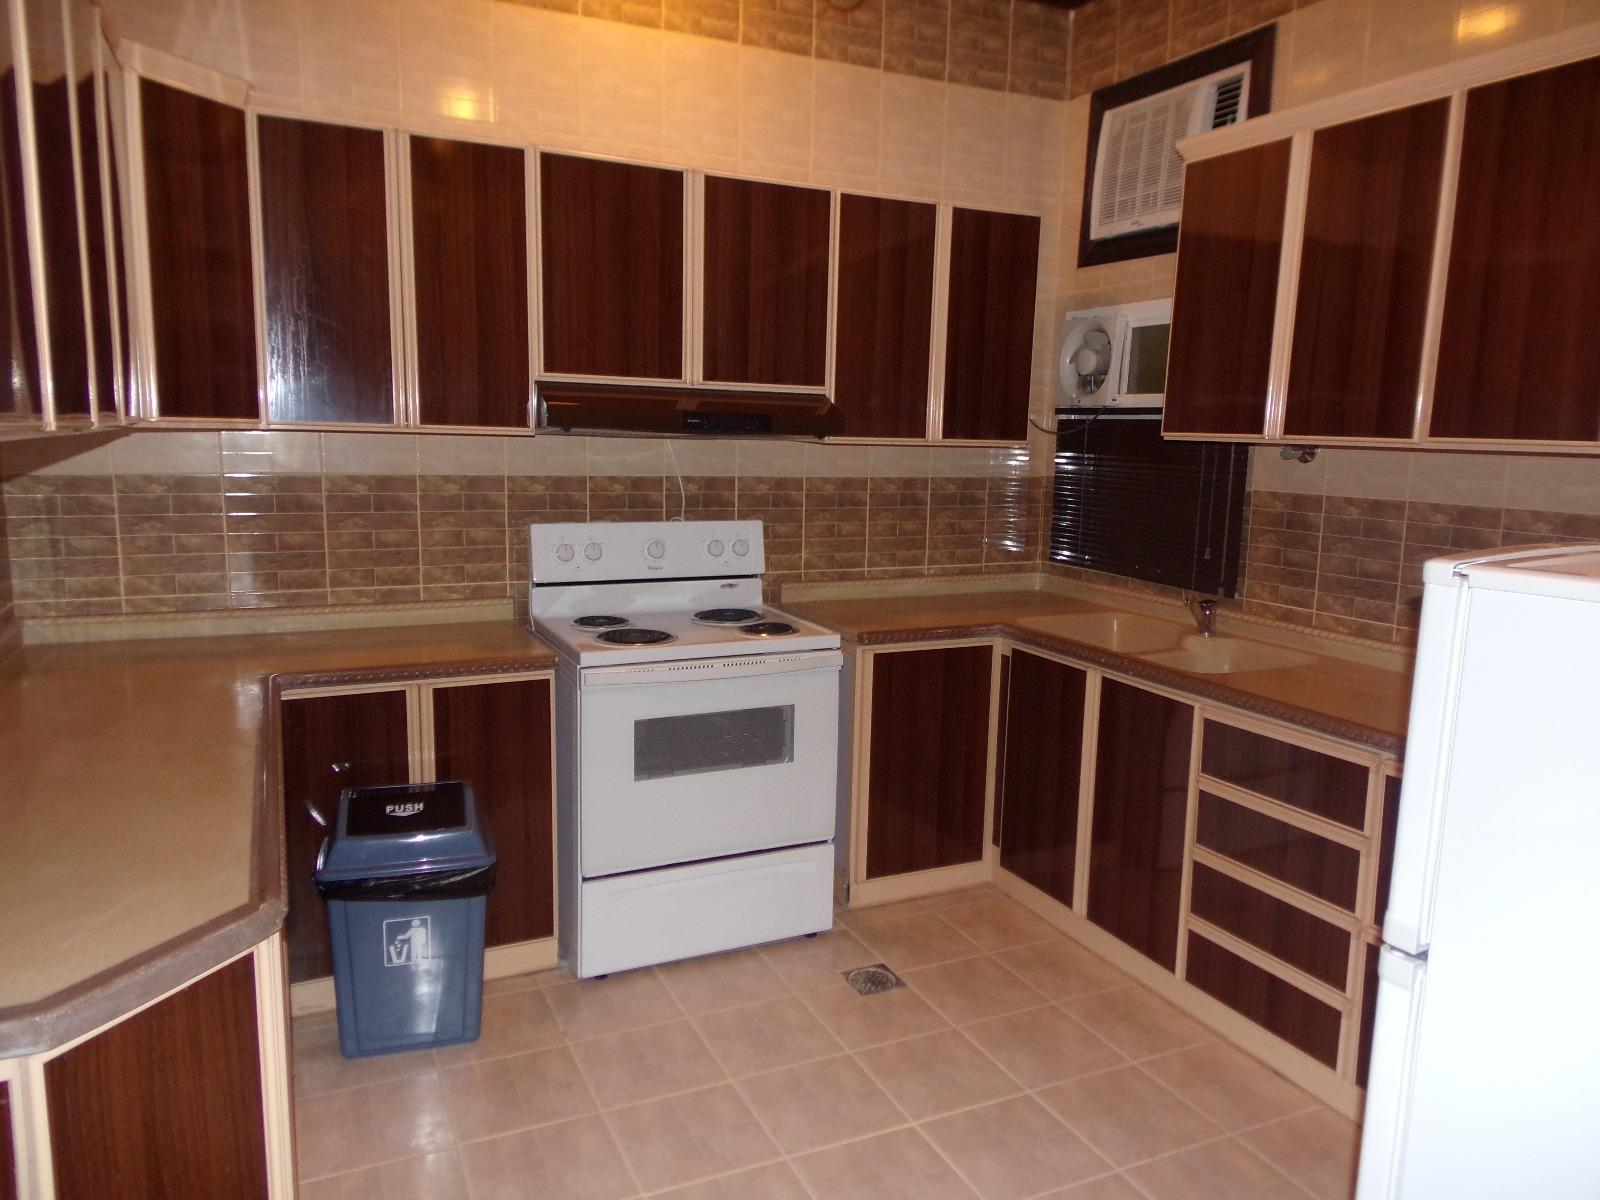 Diyar Ahmed Apartment